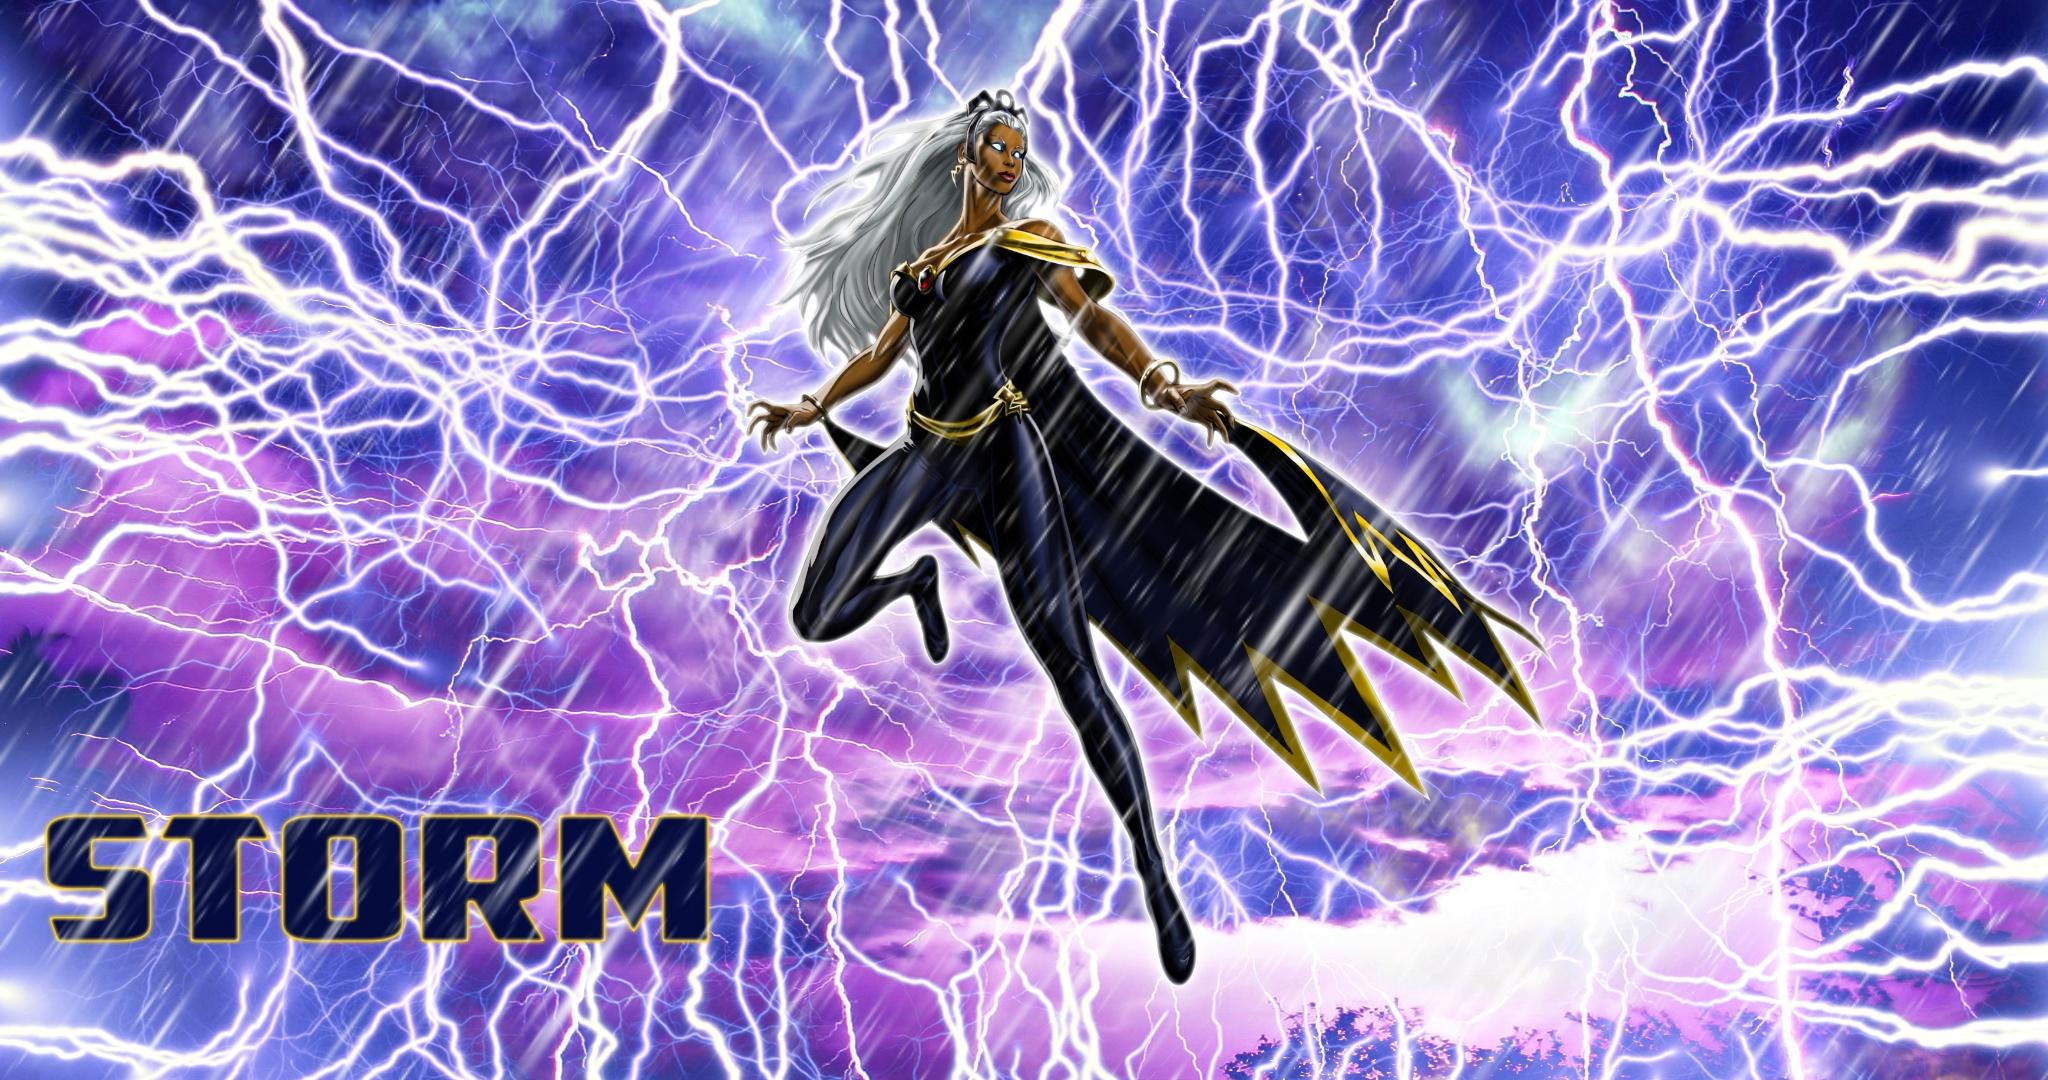 storm ororo munroe marvel comics x men hd wallpaper 2048x1080